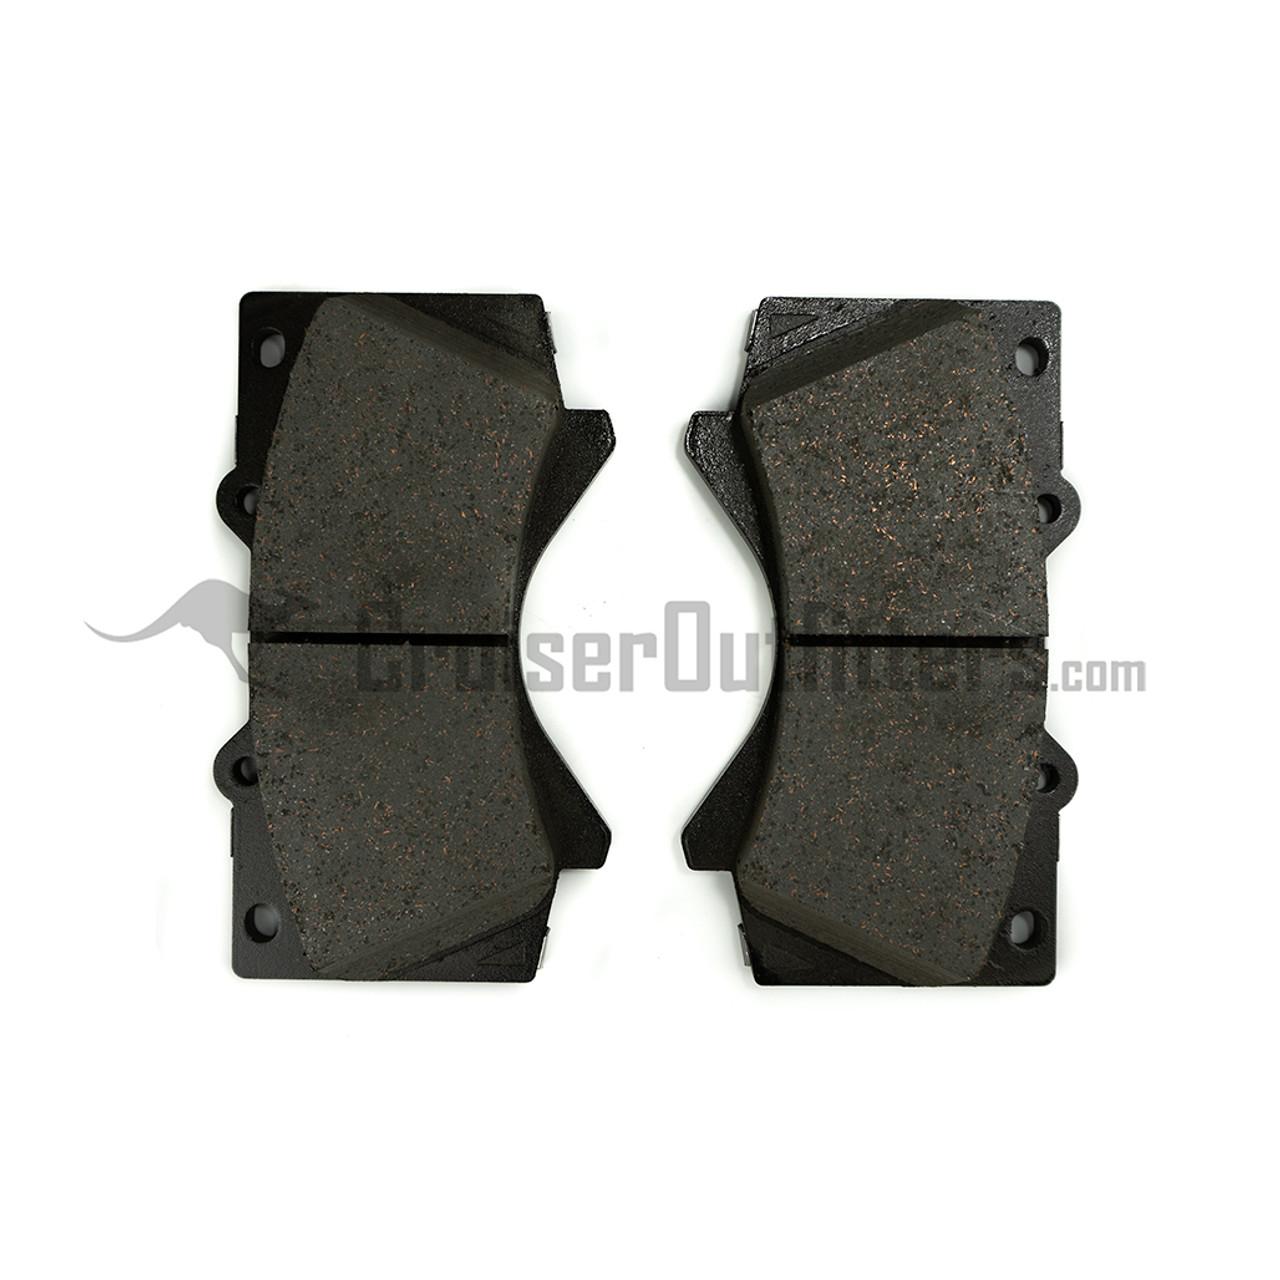 BRAD1303 - Front Brake Pads - Fits 2008+ 100 Series (ADVICS)